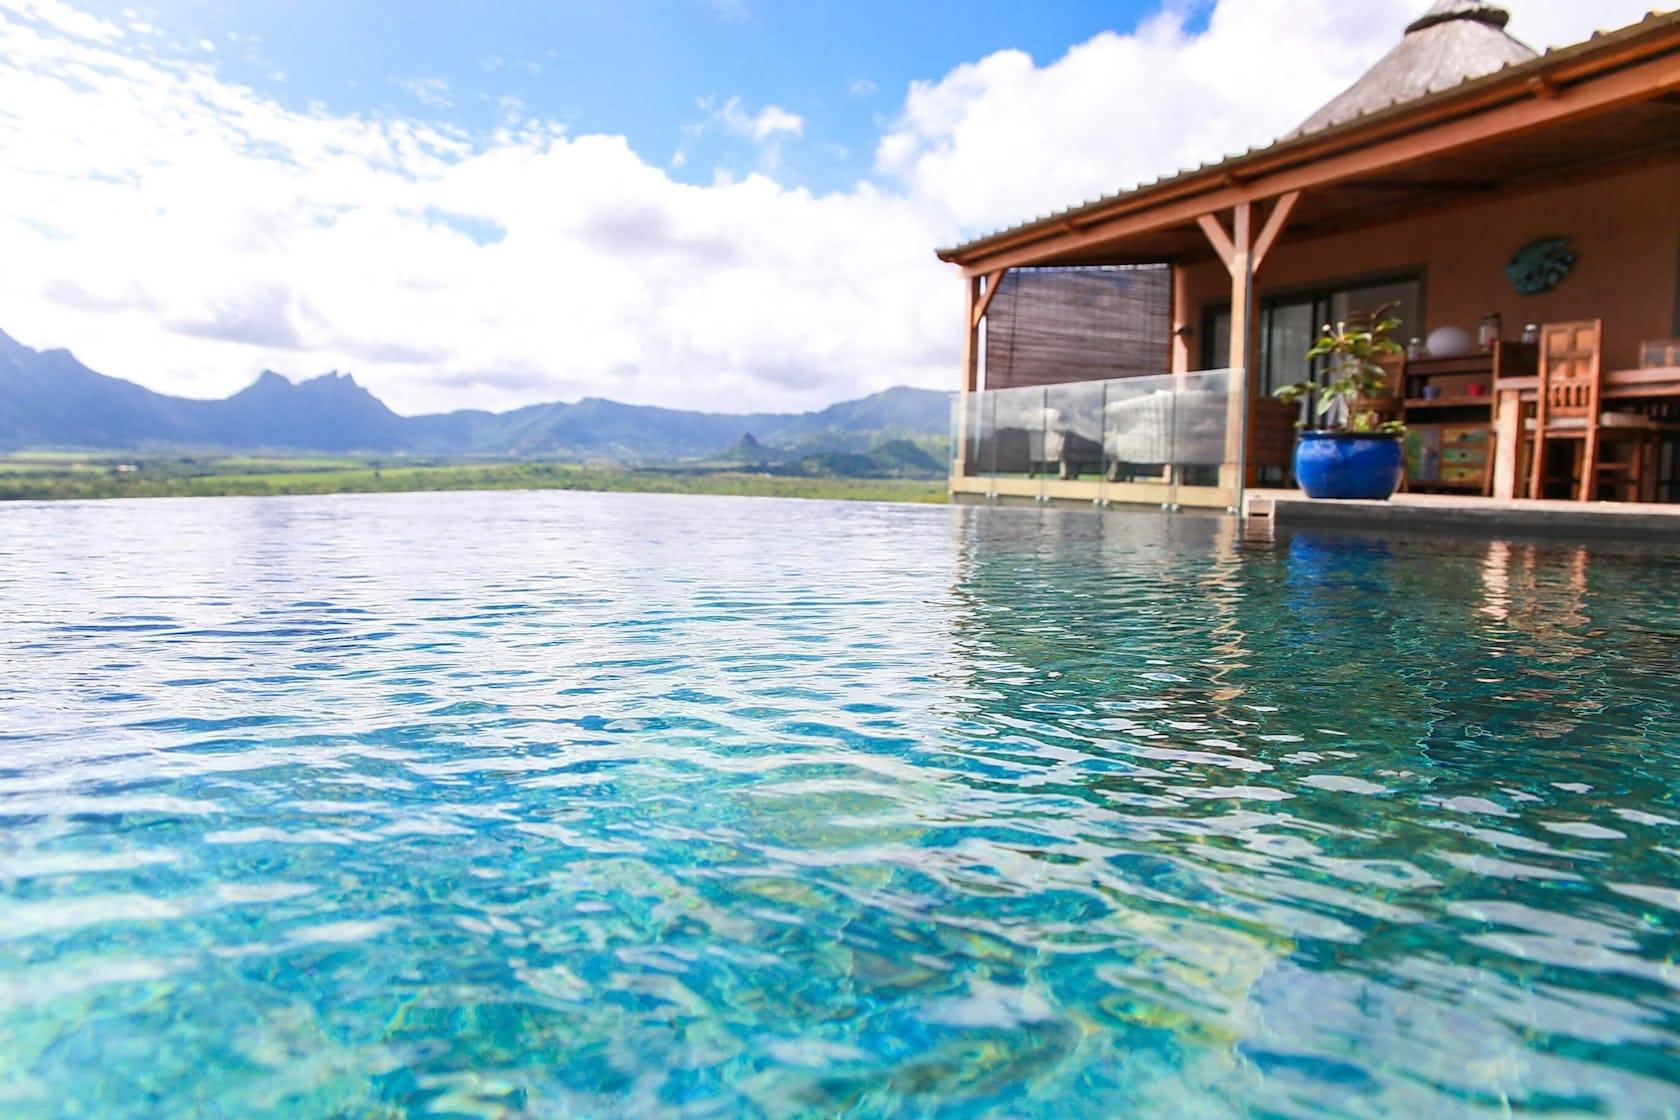 water outdoors nature building lagoon lake pool hotel housing